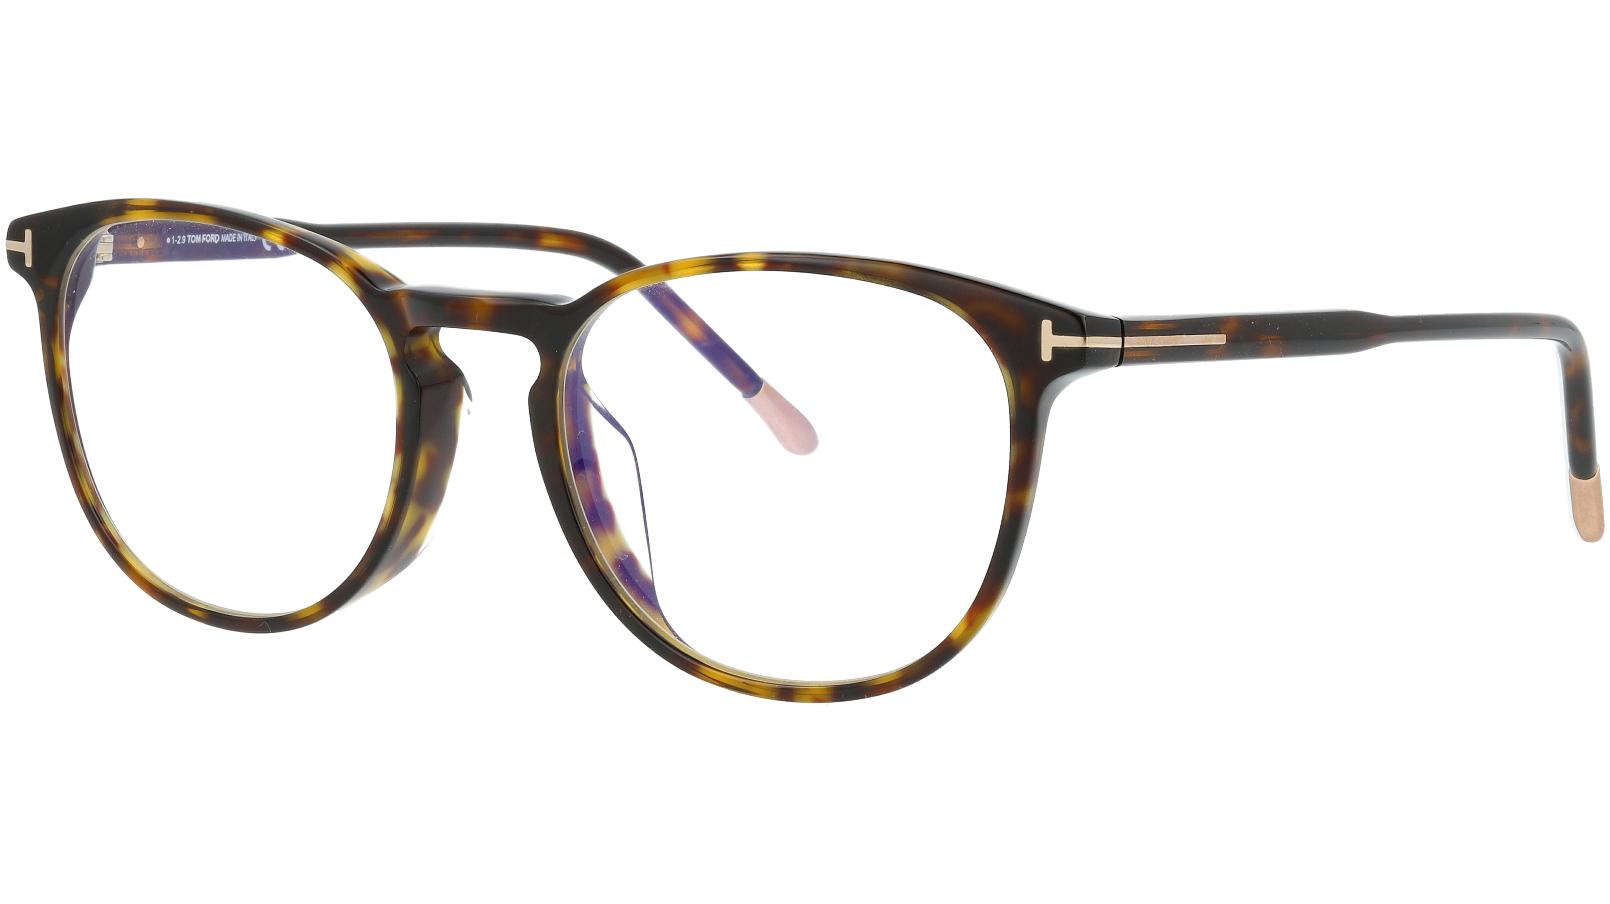 Tom Ford TF5608-B 052 52 Havana Glasses